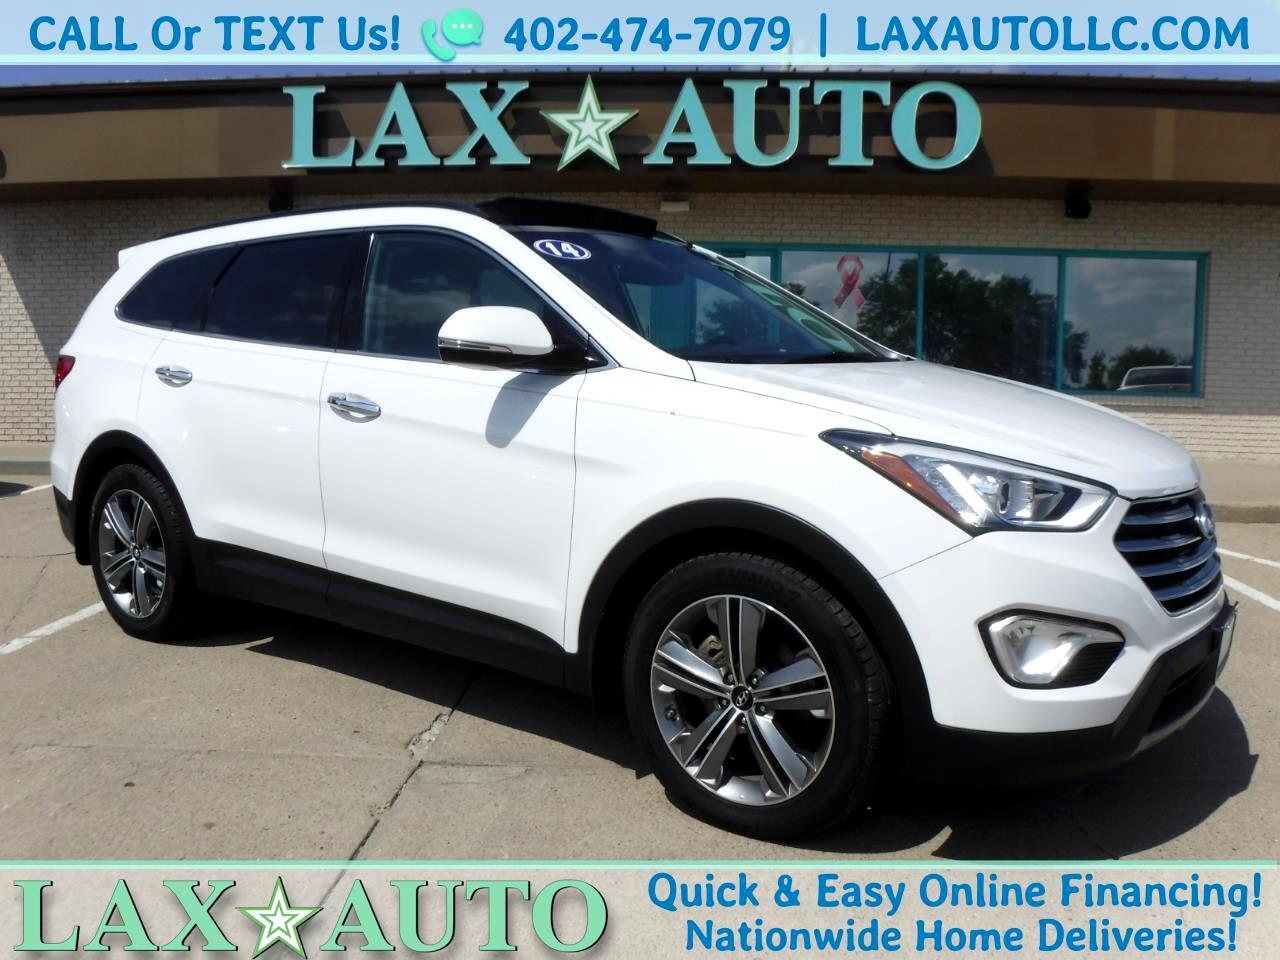 2014 Hyundai Santa Fe Limited AWD w/ Ultimate Pkg! * 59k Miles *